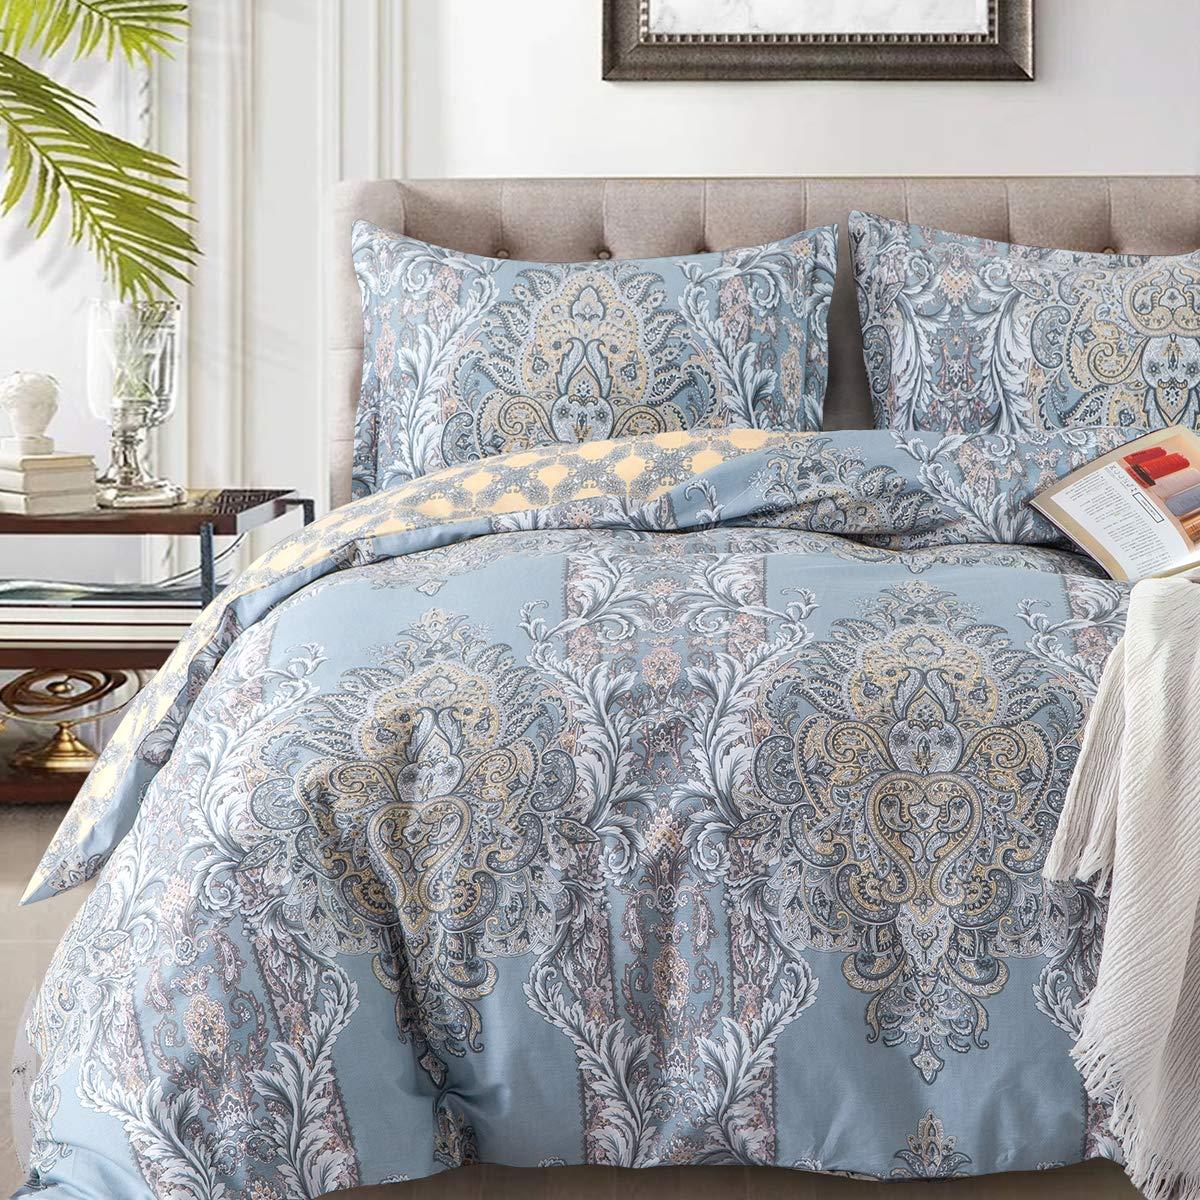 Duvet Covers Sets Cotton Queen Luxury Paisley Damask Medallion -1000TC Egyptian Cotton Duvet Cover- ReversiblePercale Weave Comforter Cover Set-3pcs Soft Breathable Bedding(Queen,Light Blue Floral)